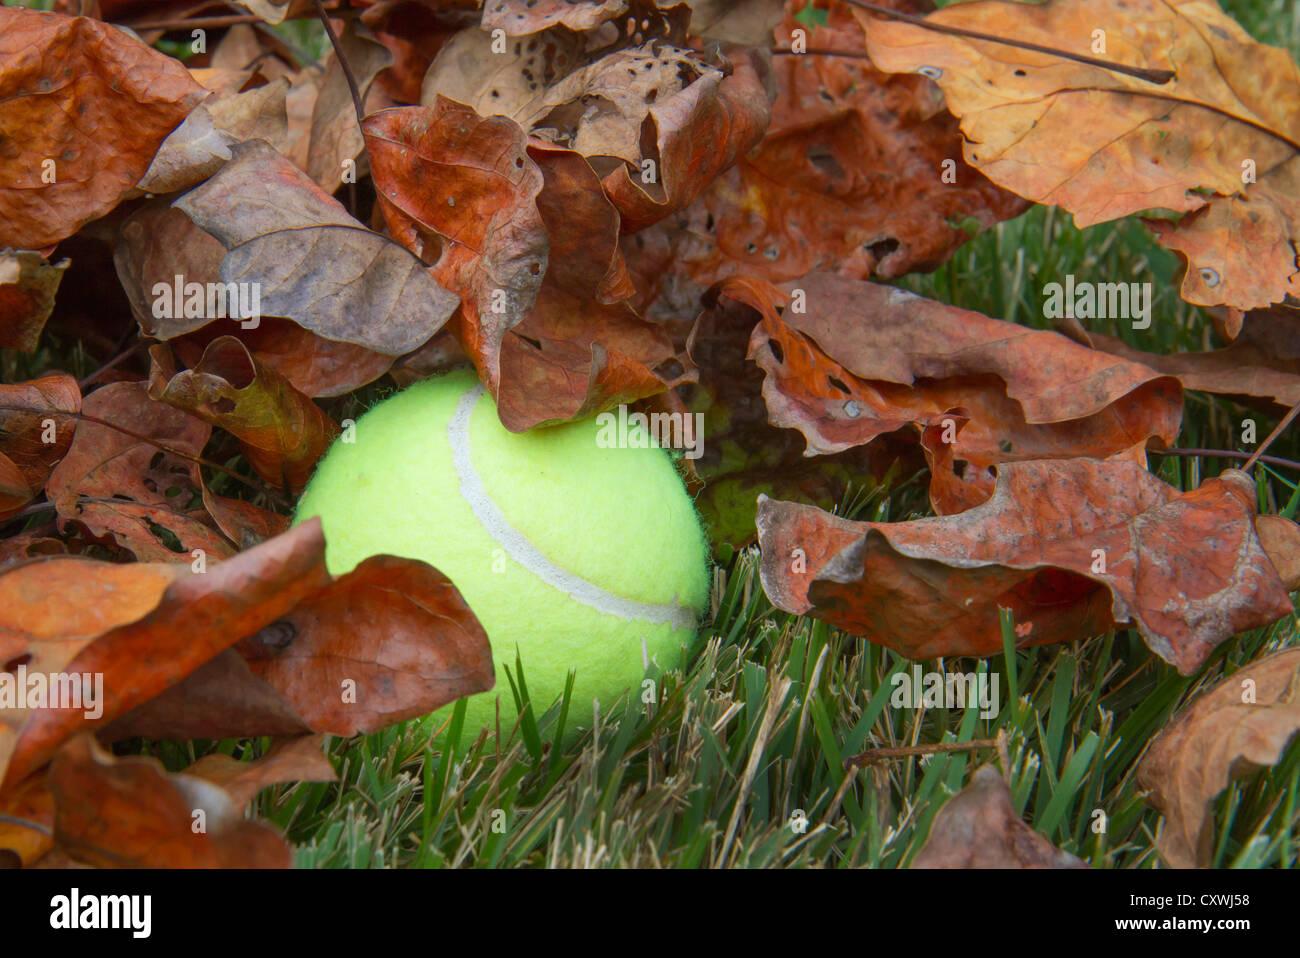 Ein Tennisball in trockene Blätter verloren. Stockbild